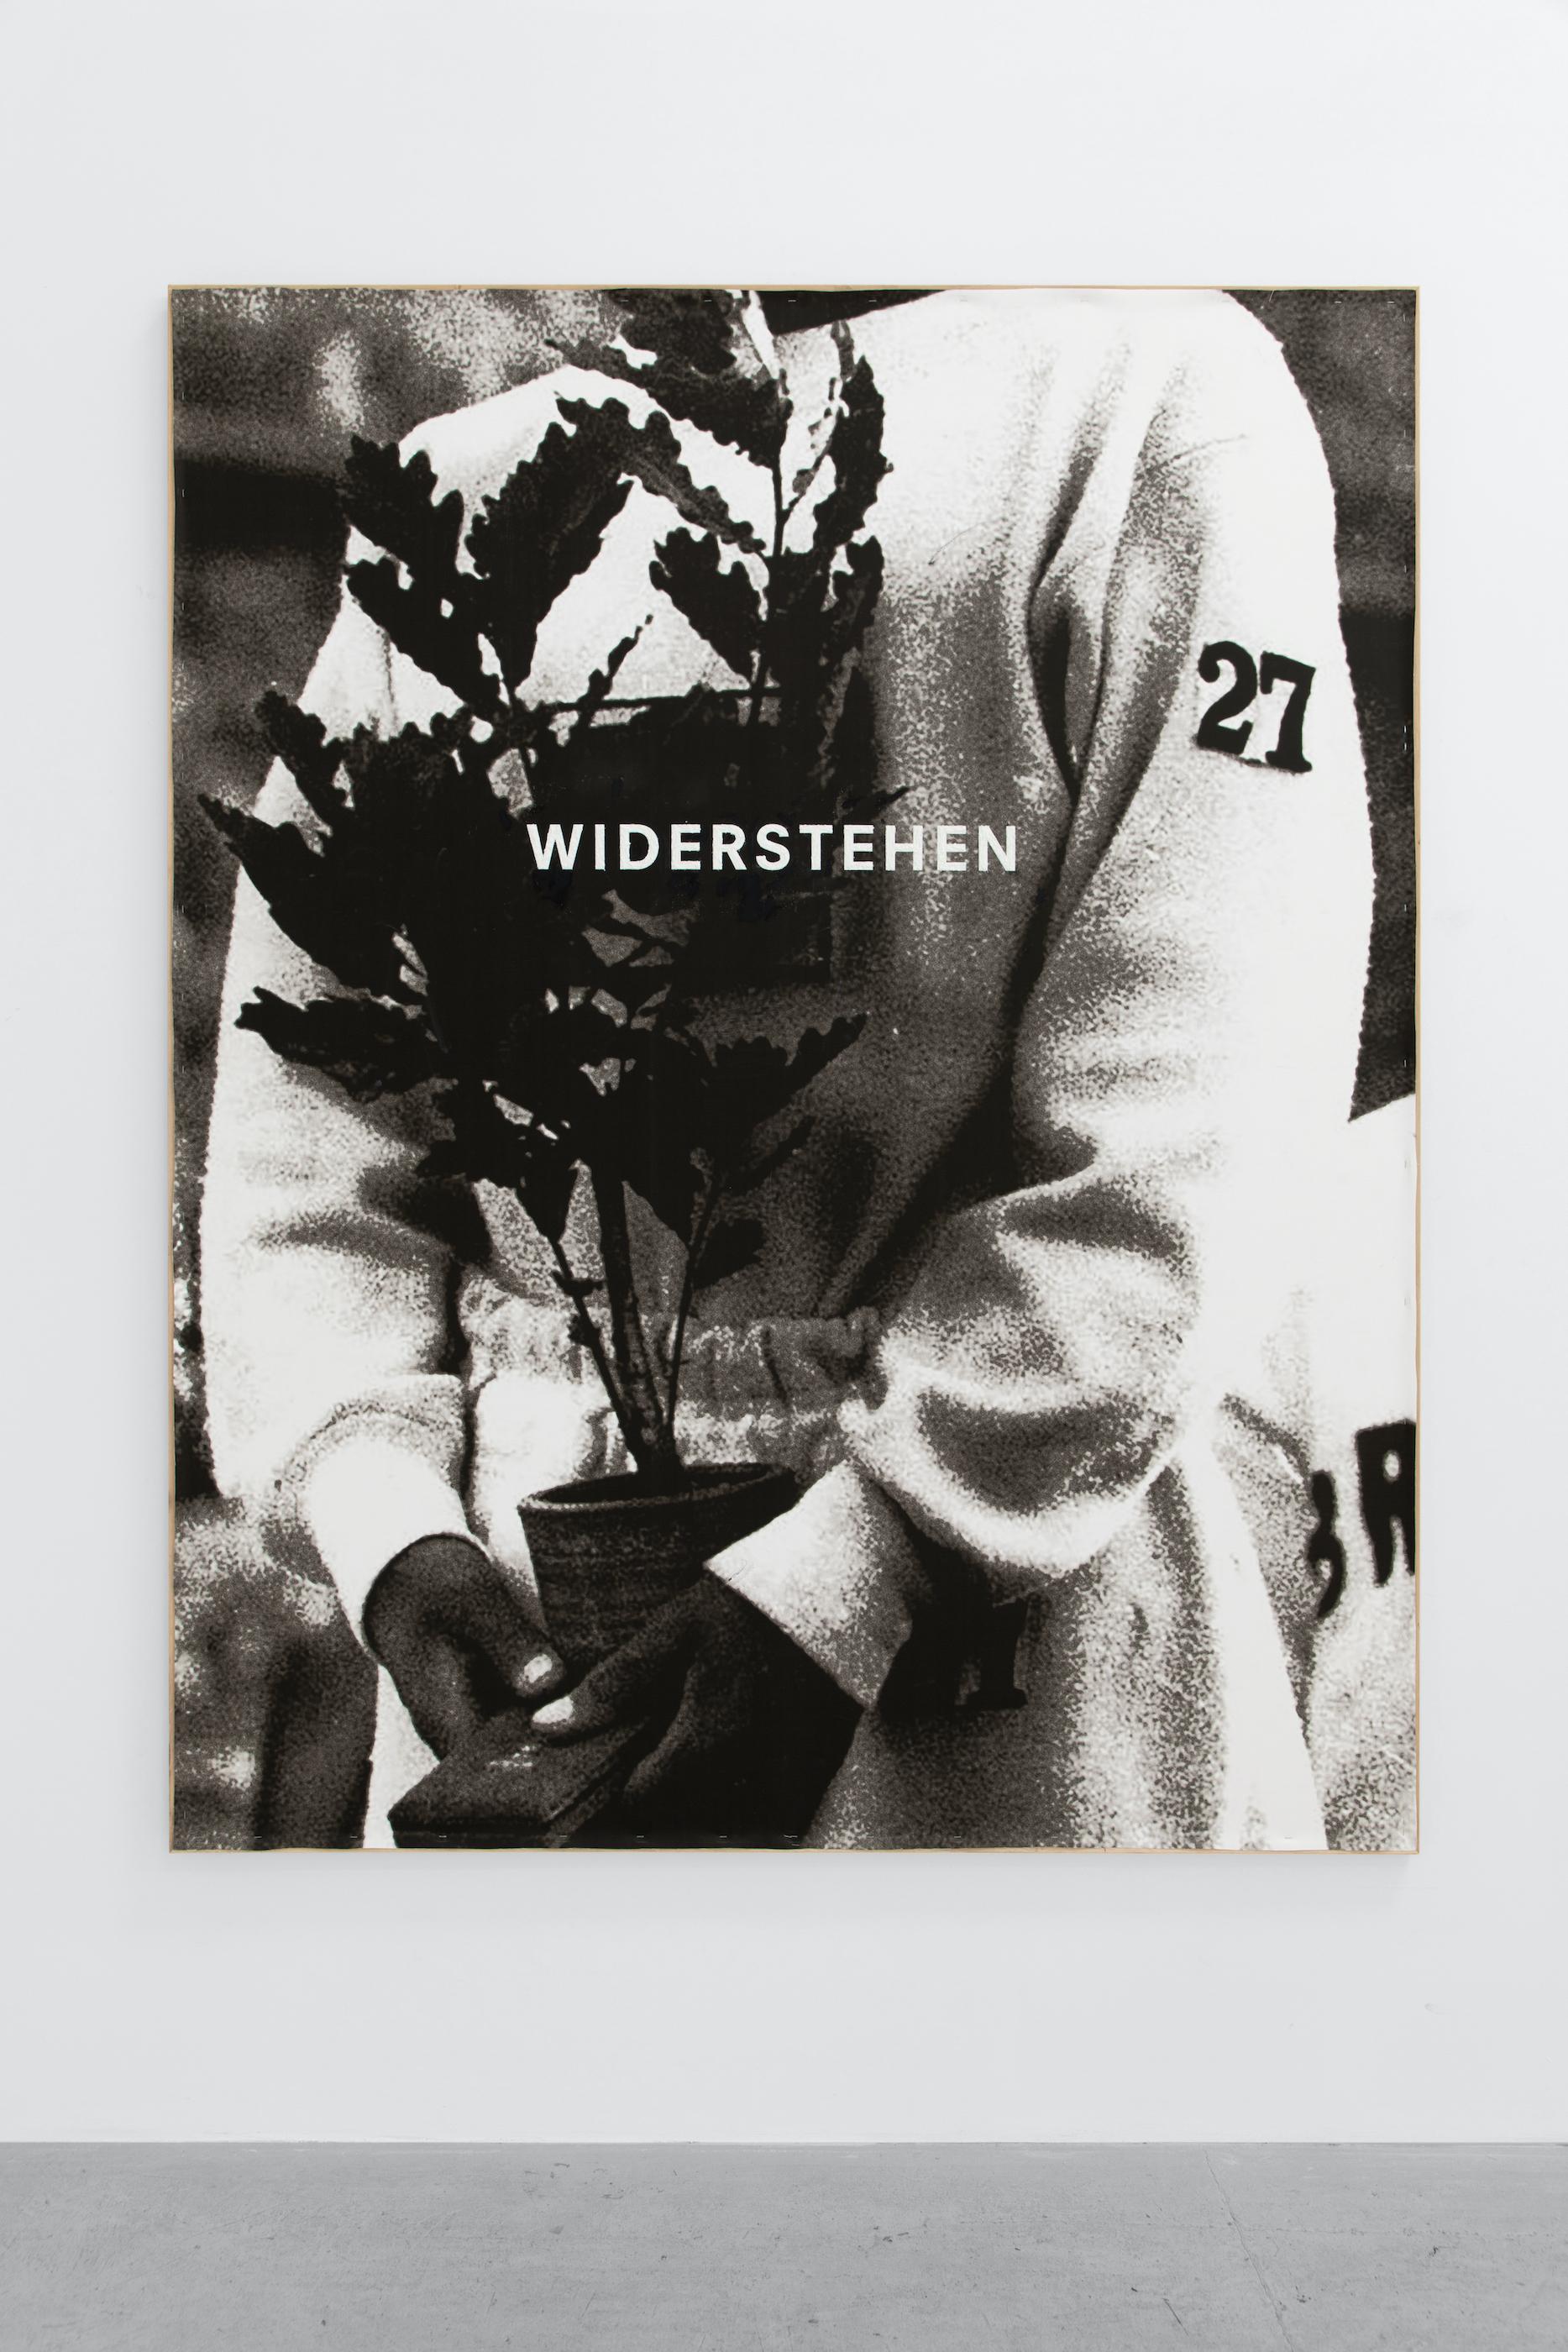 """¿Por qué no son todos así, como yo debiera ser?"" (Why aren't they all like that, as I should be?), solo exhibition by Ian Waelder. Installation view at L21 Son Castelló."